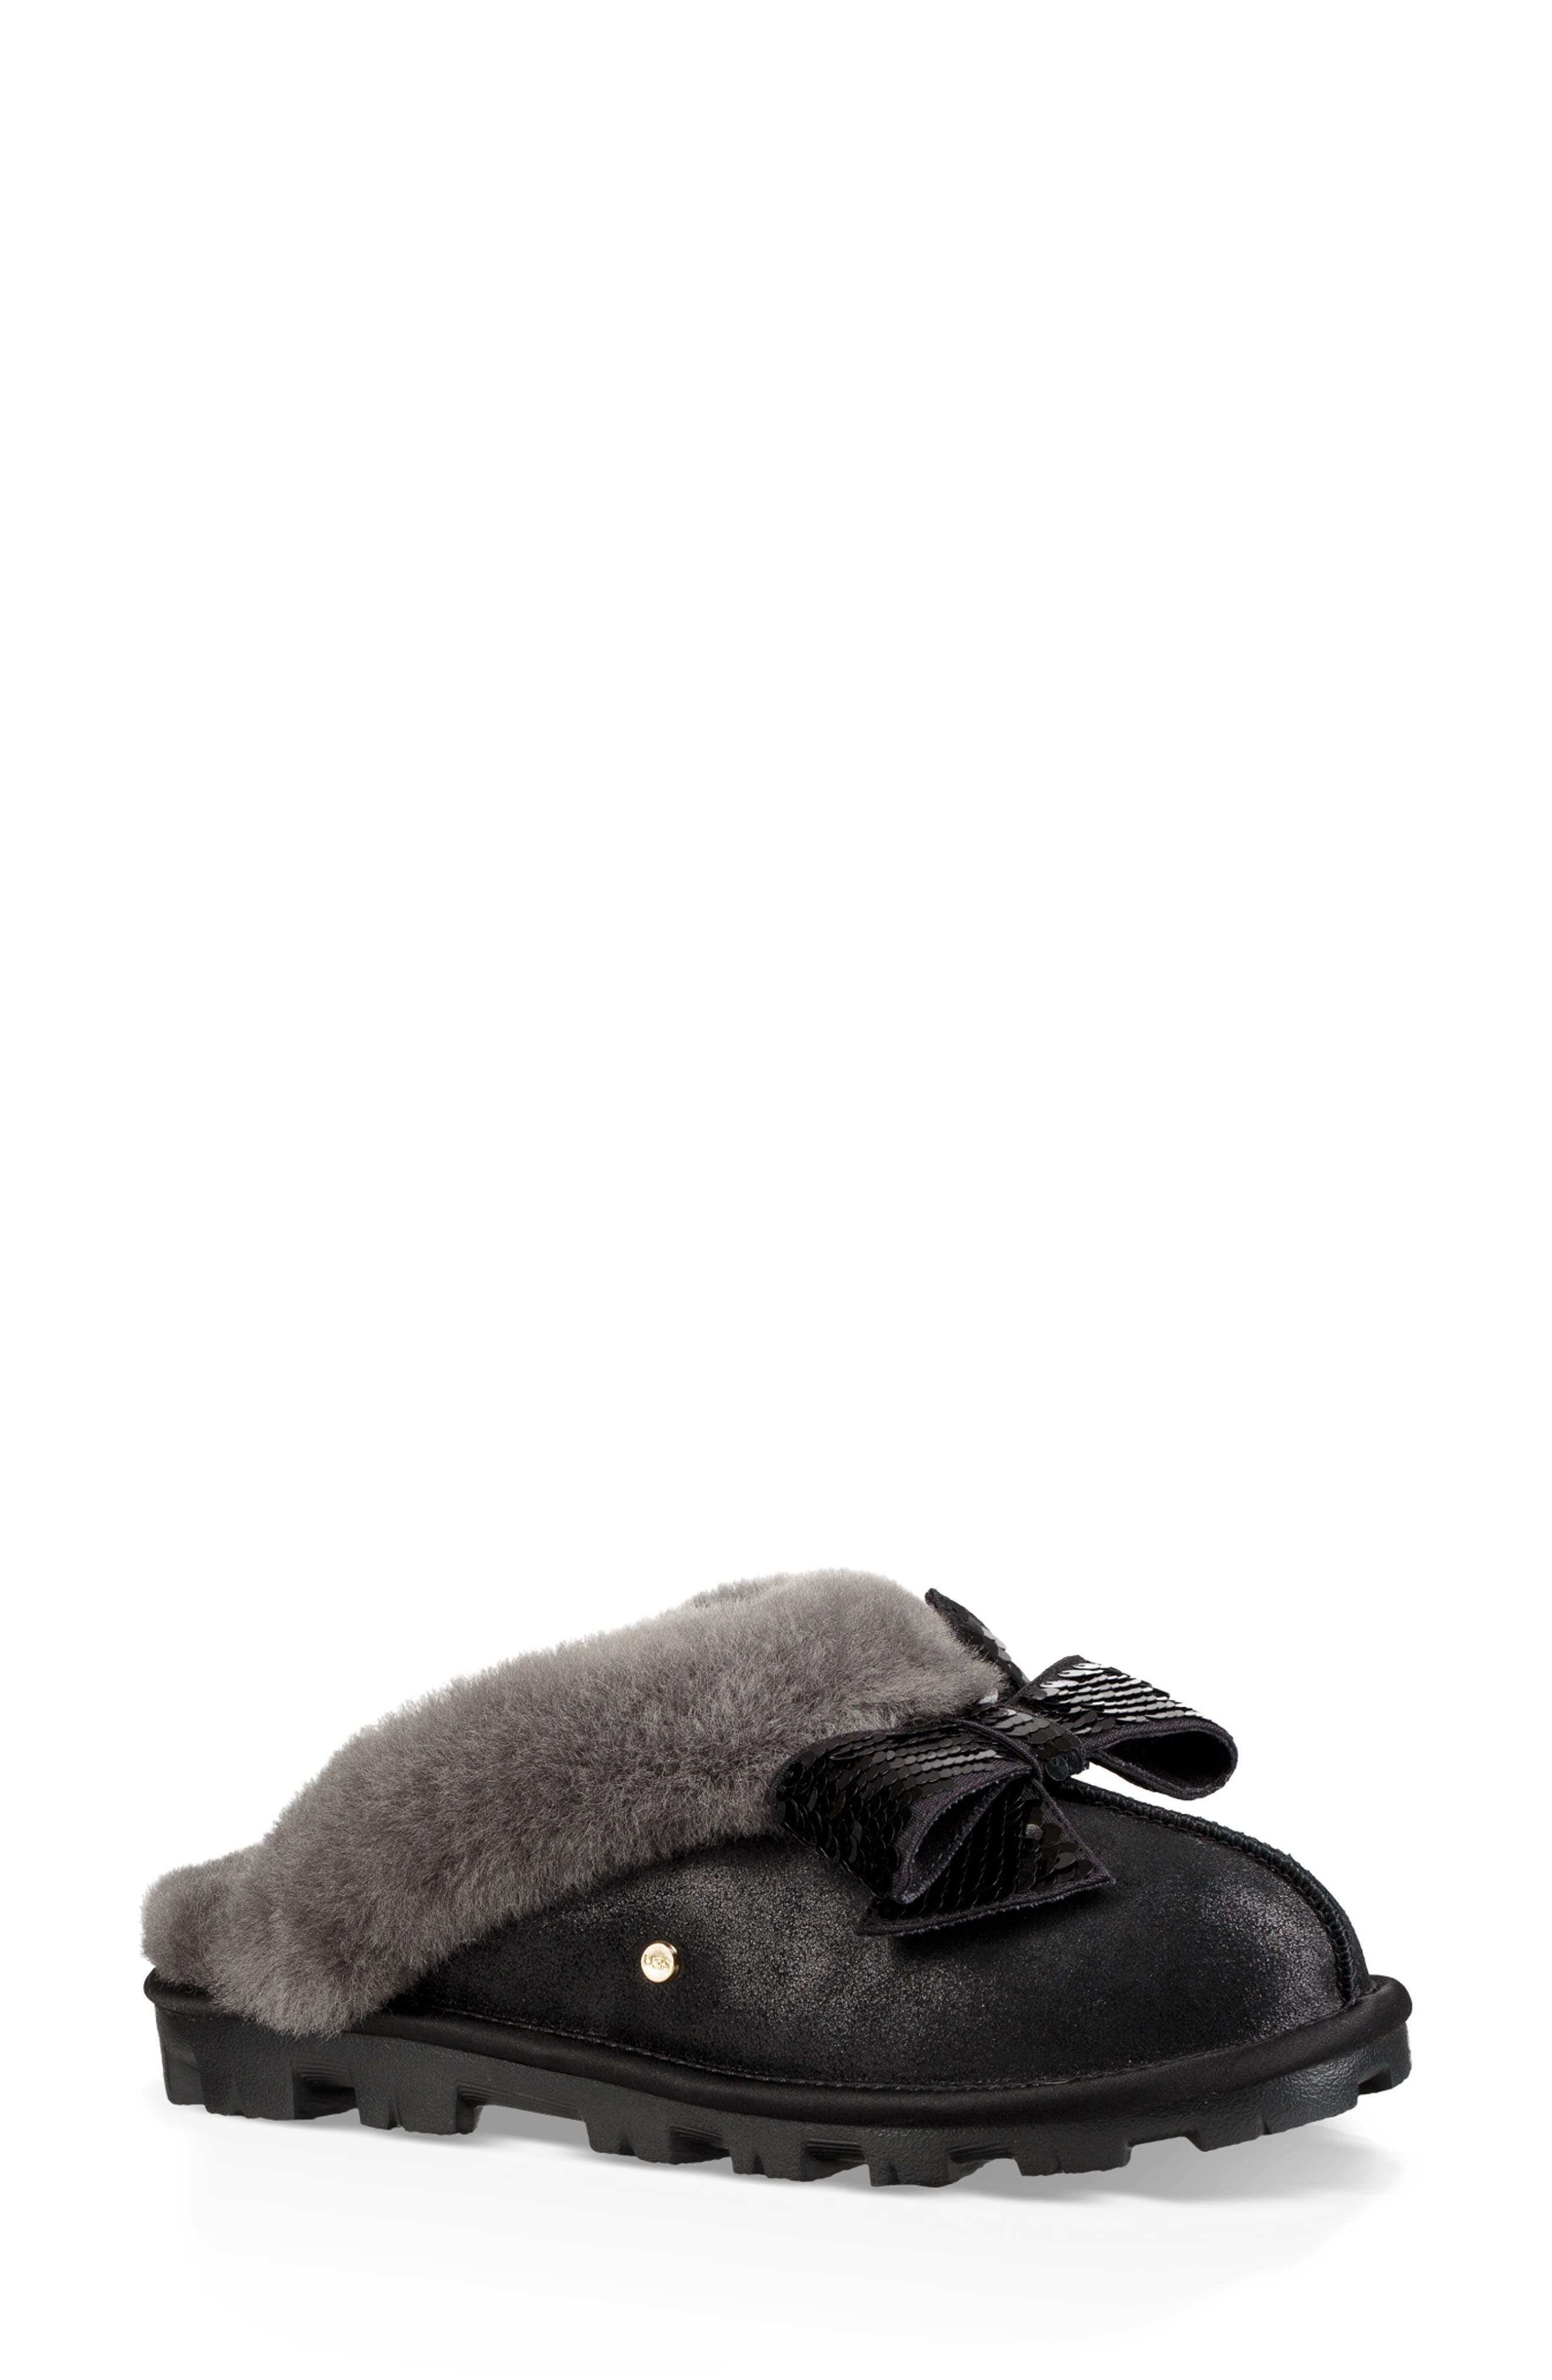 Ugg Genuine Shearling & Sequin Bow Slipper, Black